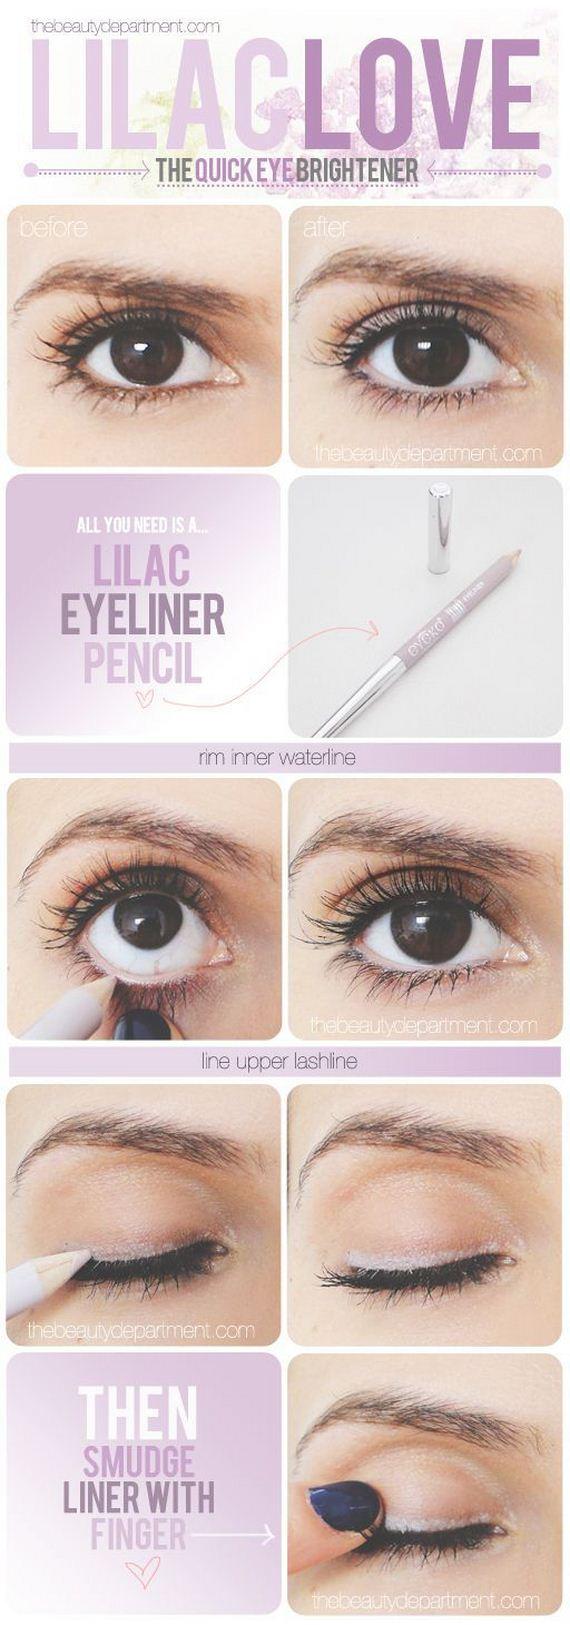 06-Fun-Eyeliner-Tutorials